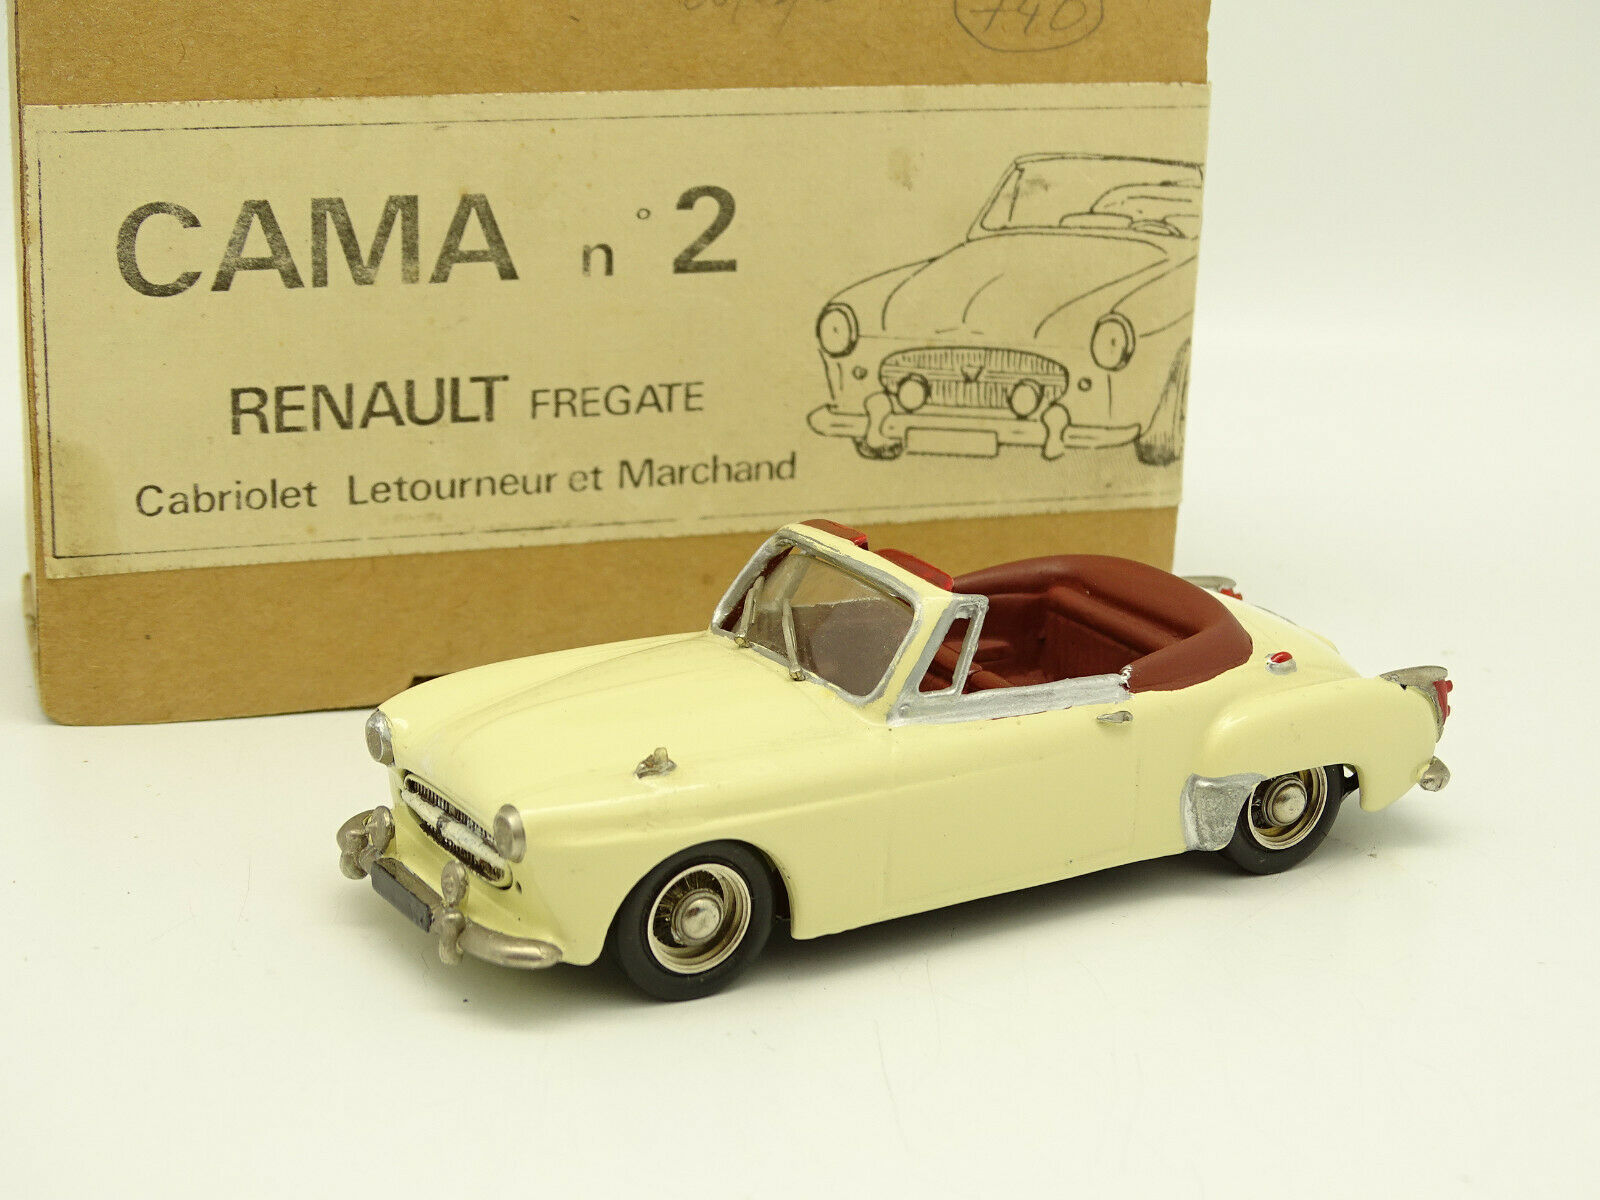 Cama Kit Montato 1 43 - Renault Fregata Cabrio Letourneur e Commerciante